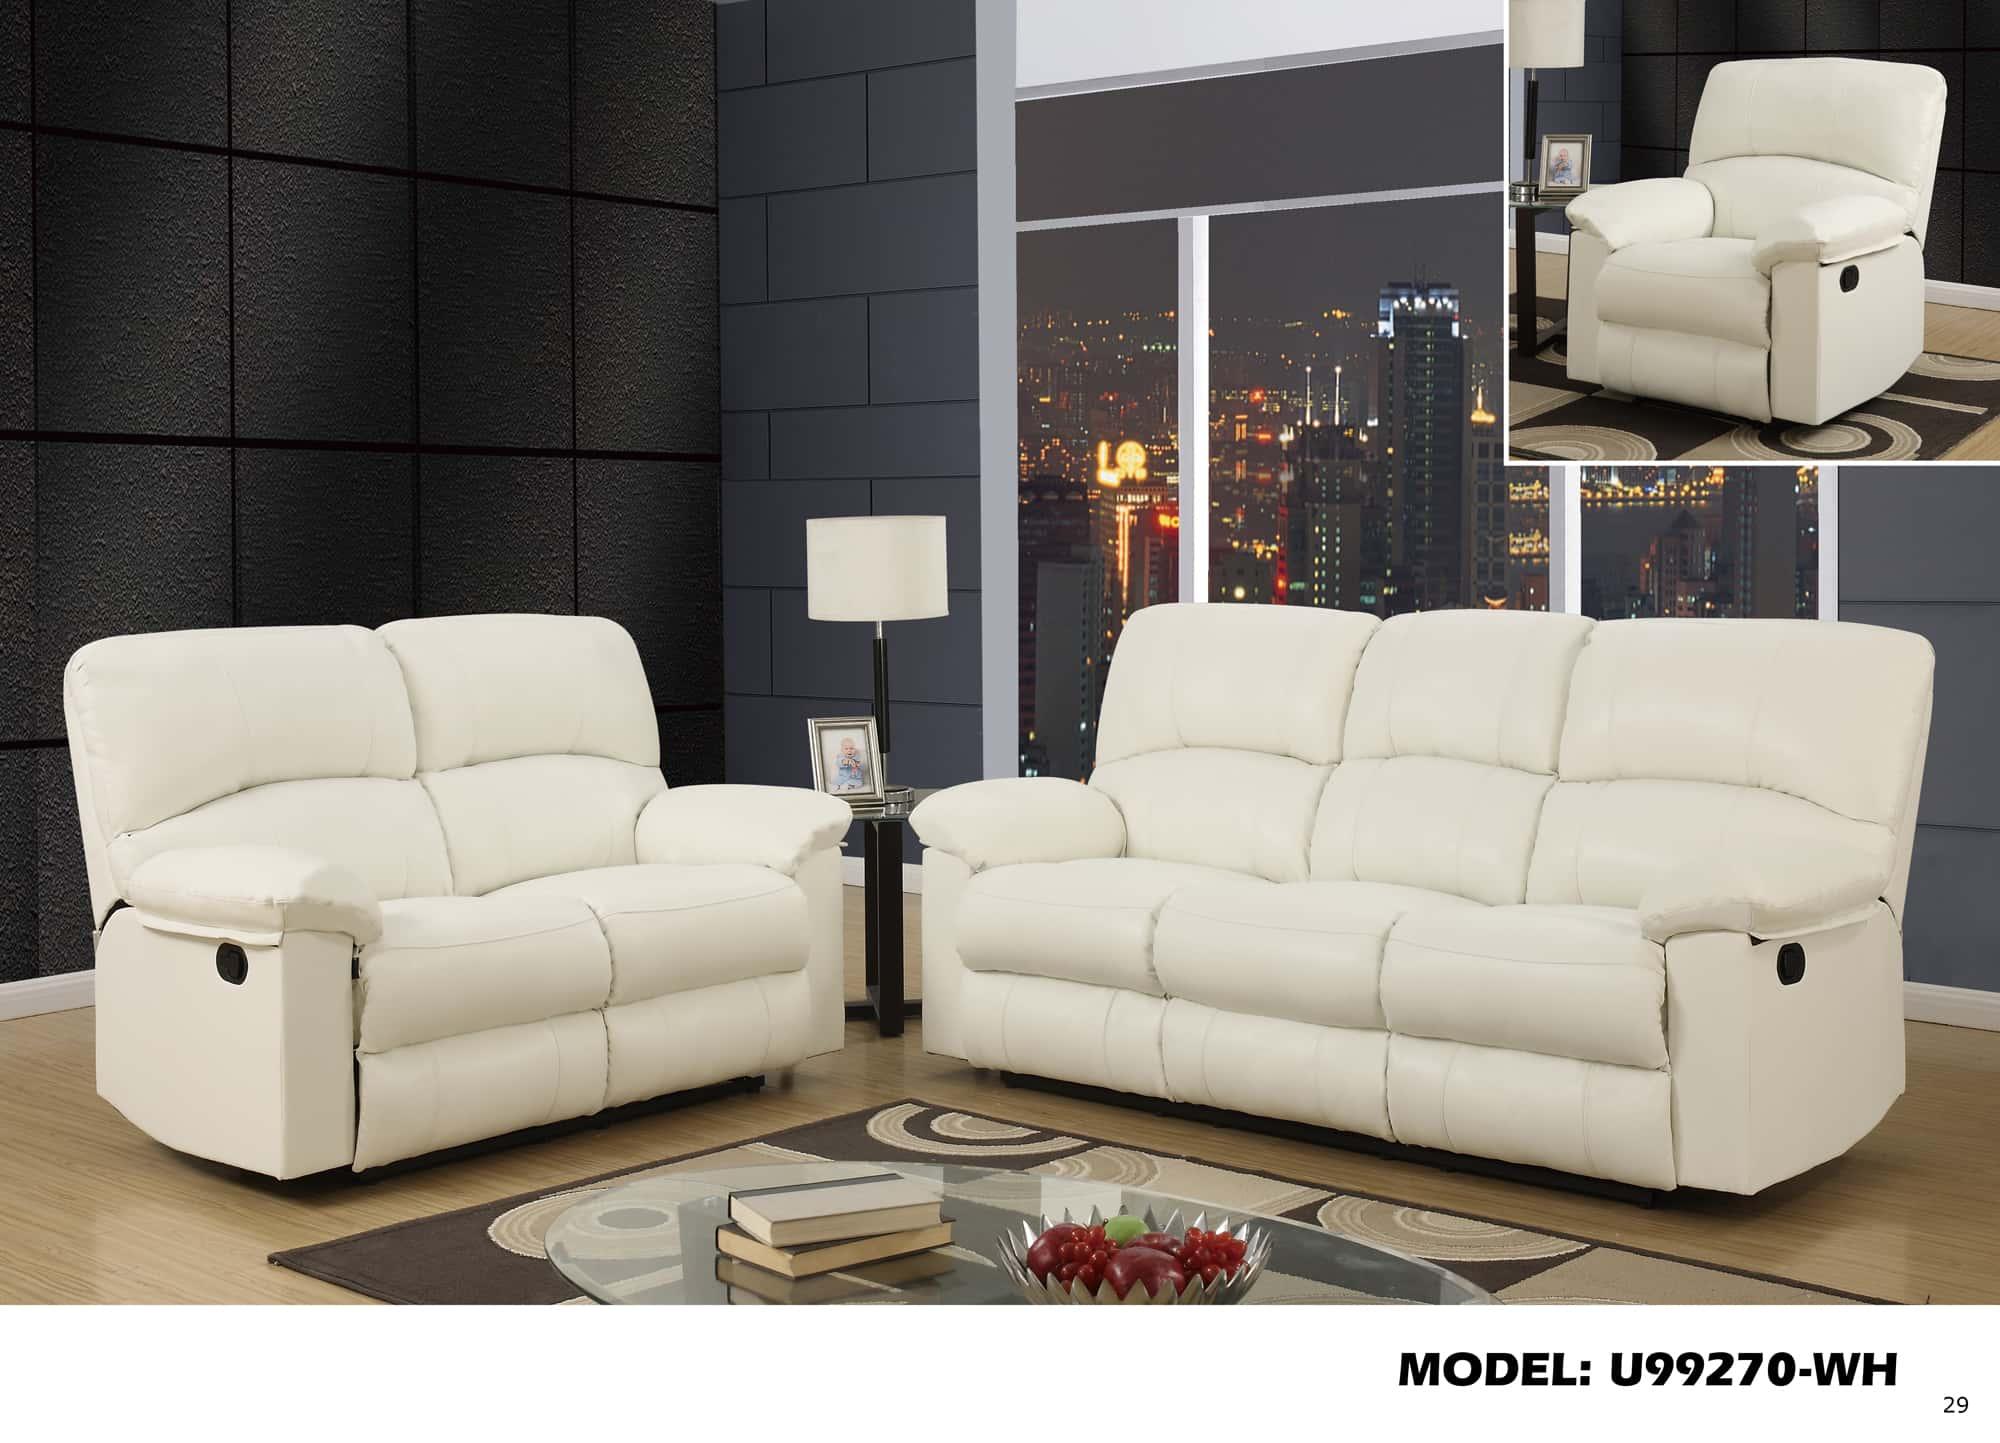 u99270 white reclining loveseat by global furniture. Black Bedroom Furniture Sets. Home Design Ideas